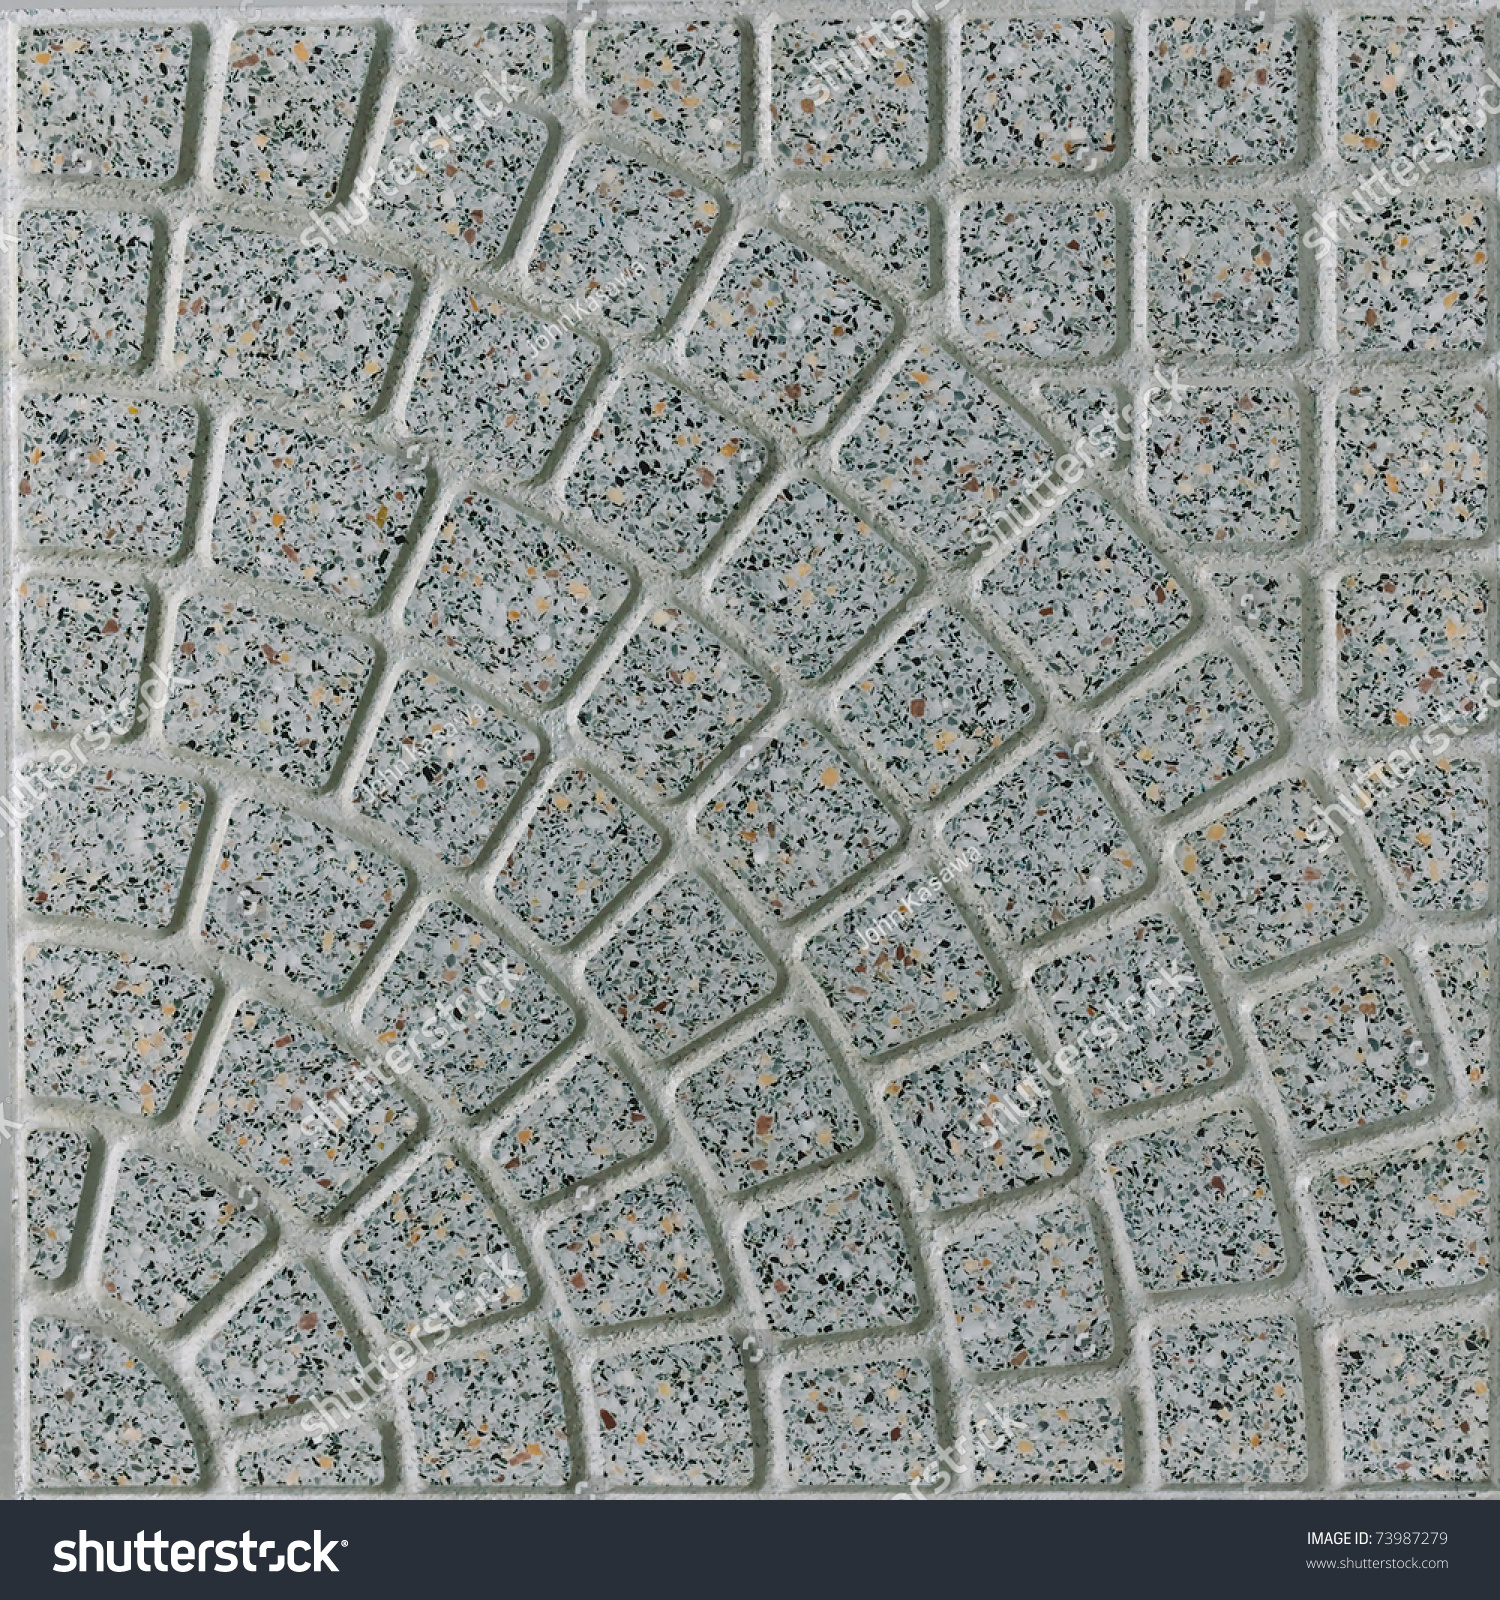 Rough tiles flooring